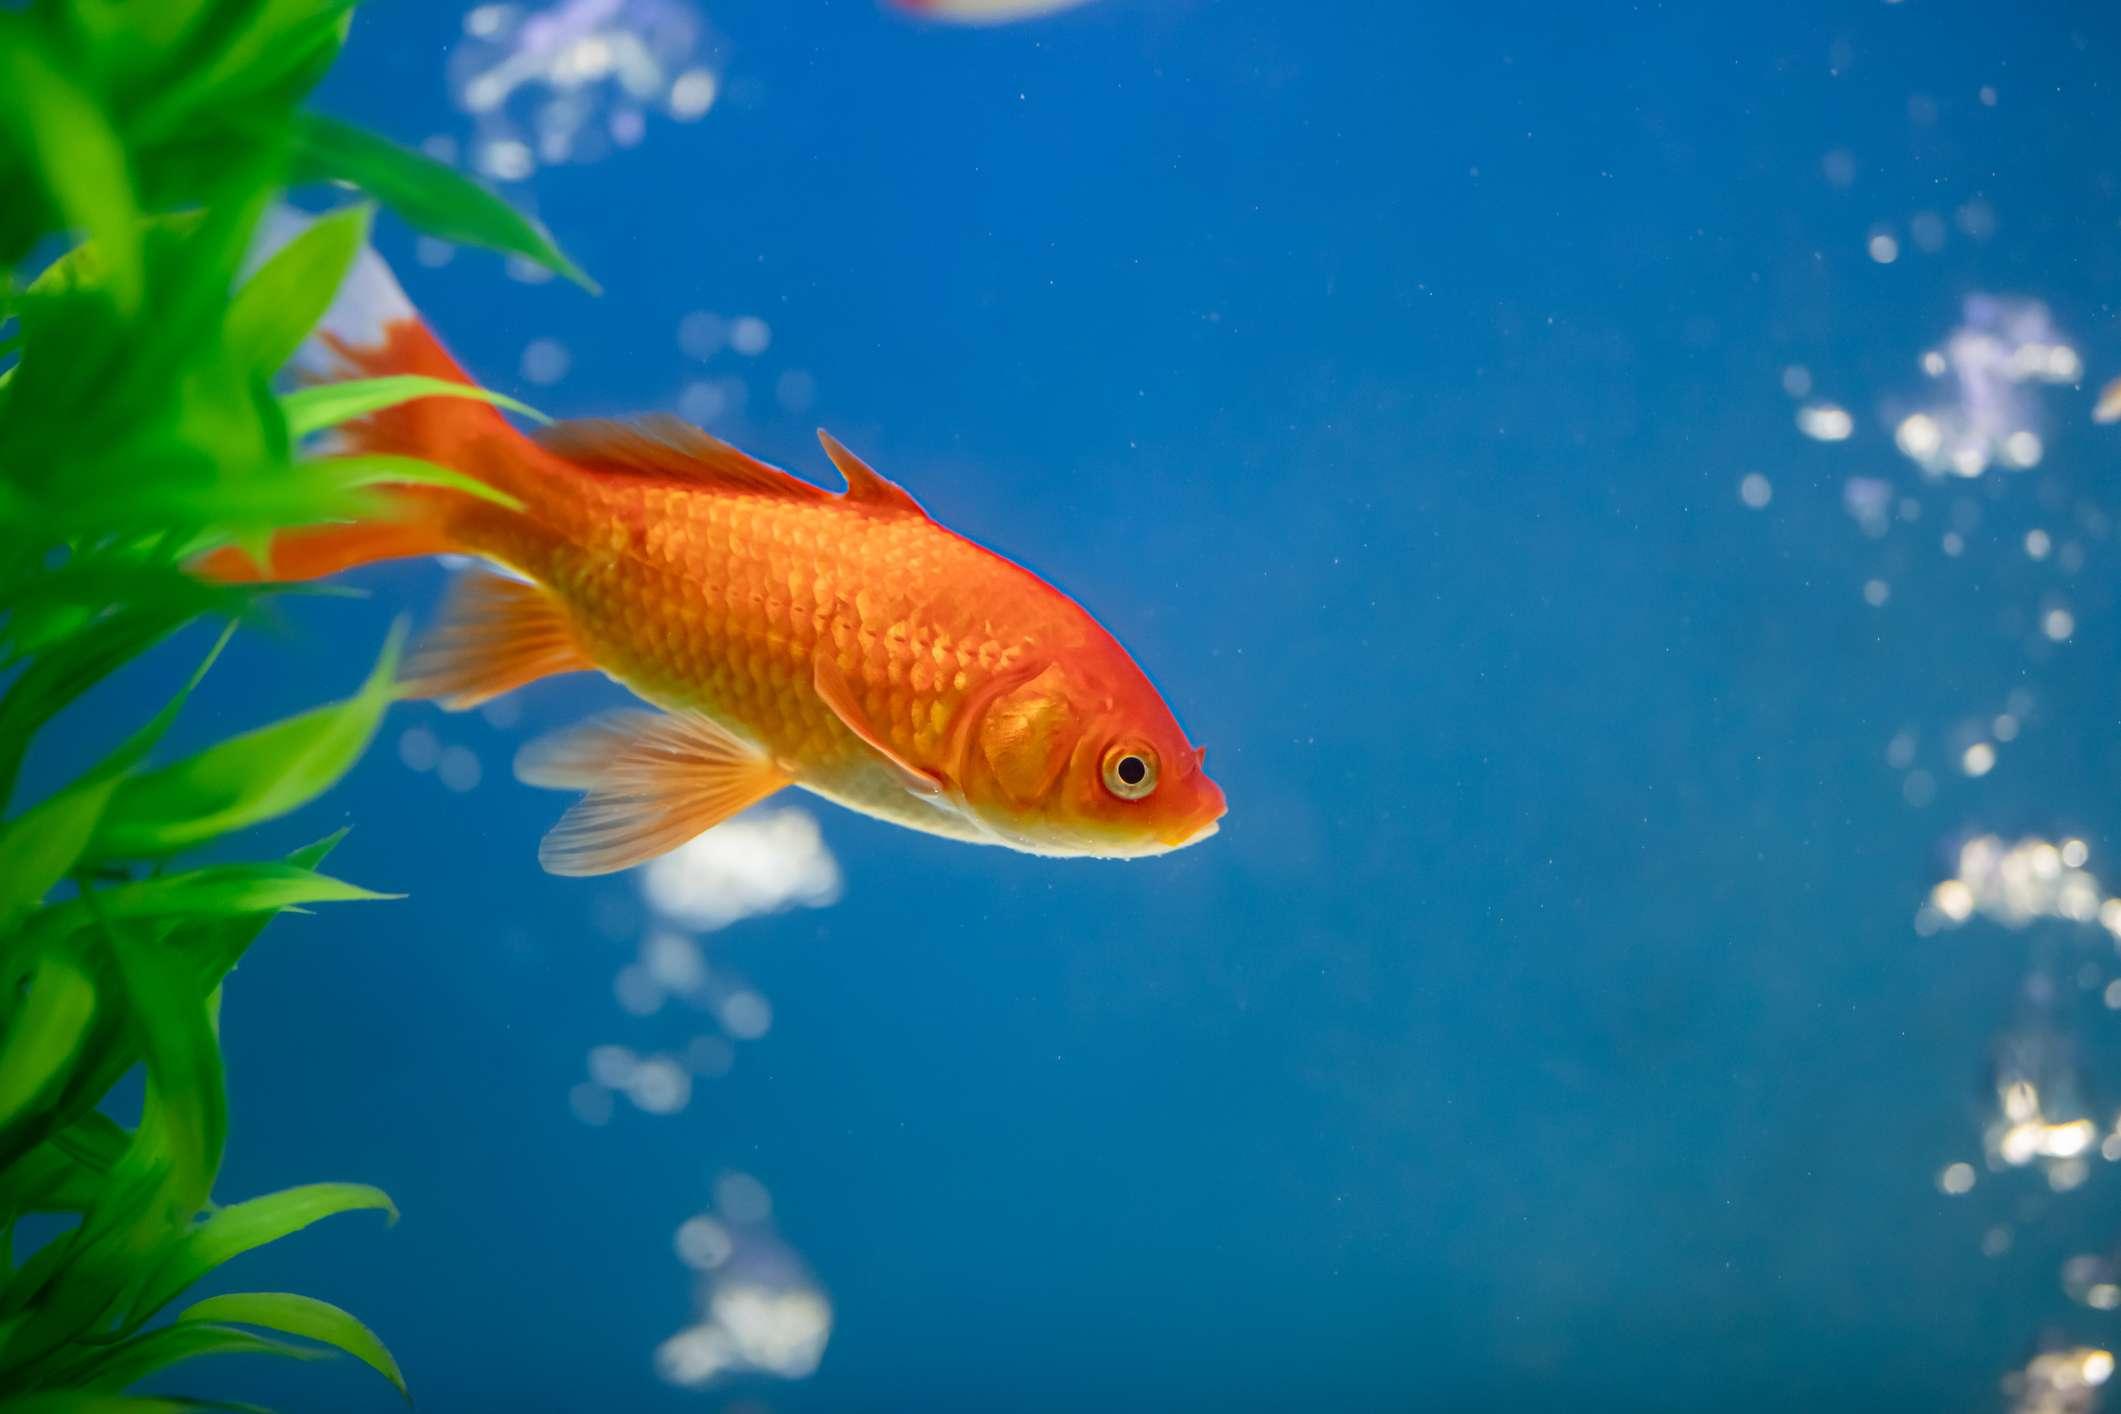 Comet goldfish in tank